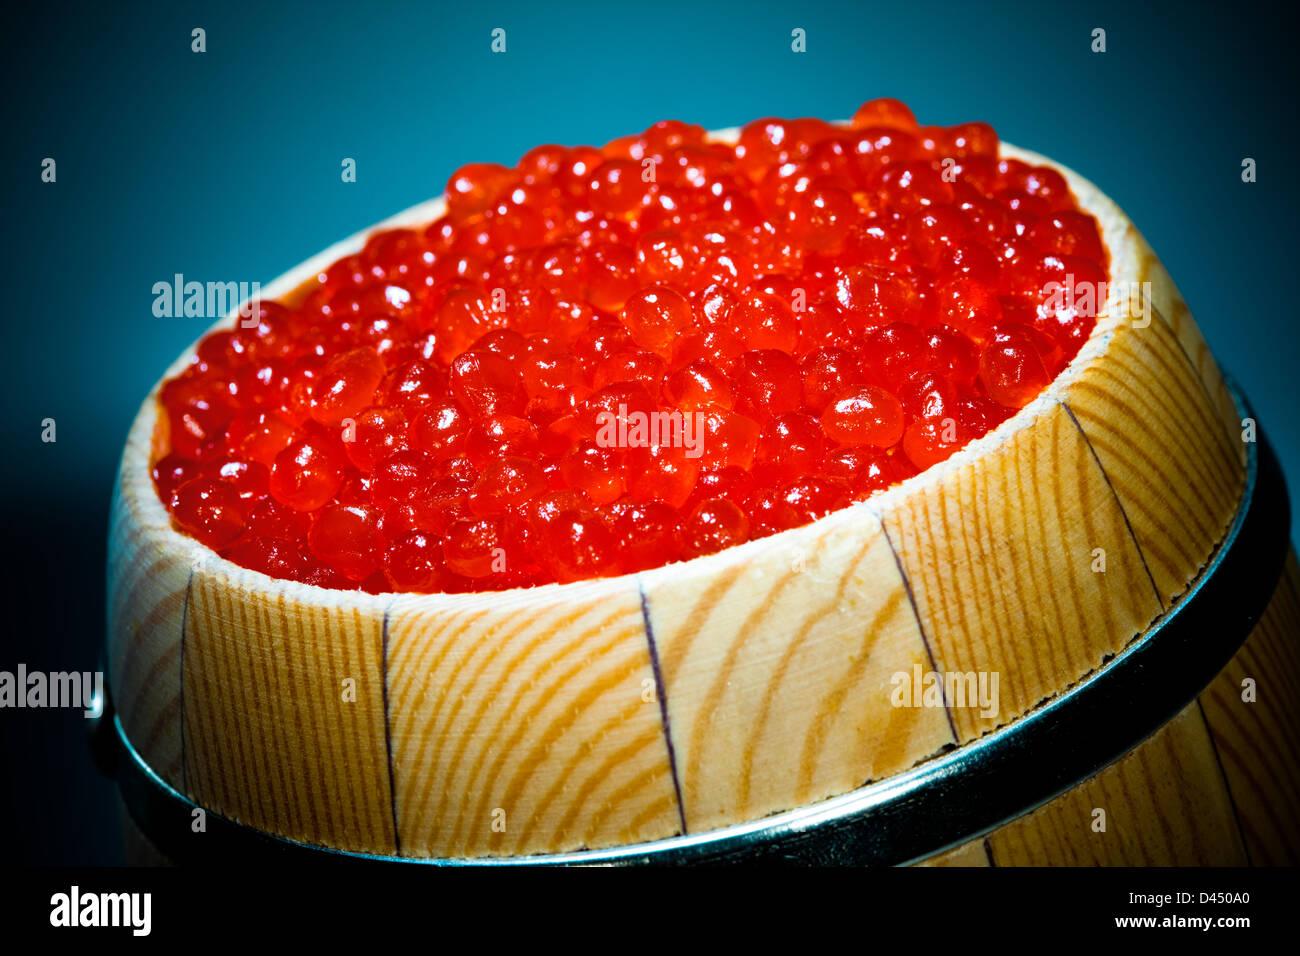 Russian red caviar in small barrel - Stock Image